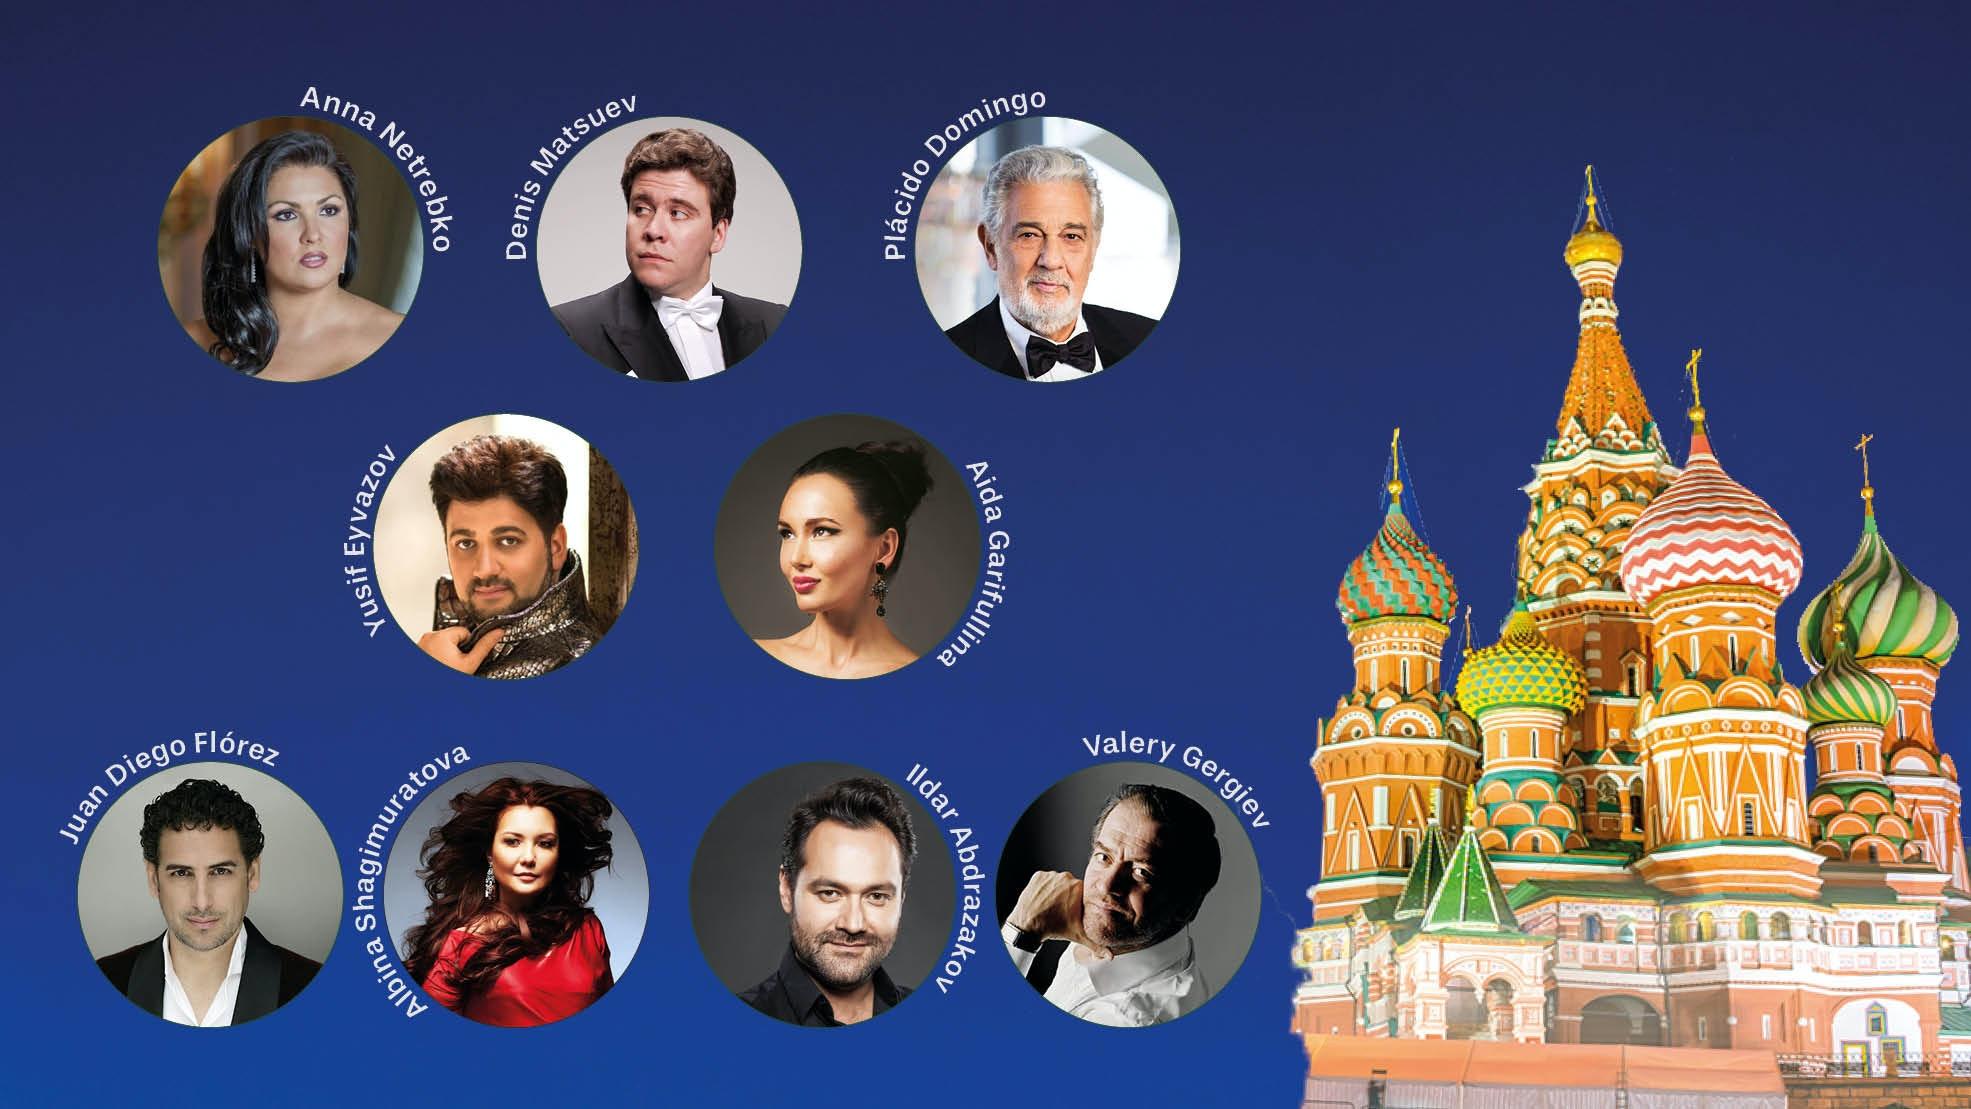 ⚽ 2018 World Cup Gala Concert – With Anna Netrebko, Plácido Domingo, Denis Matsuev, Valery Gergiev...